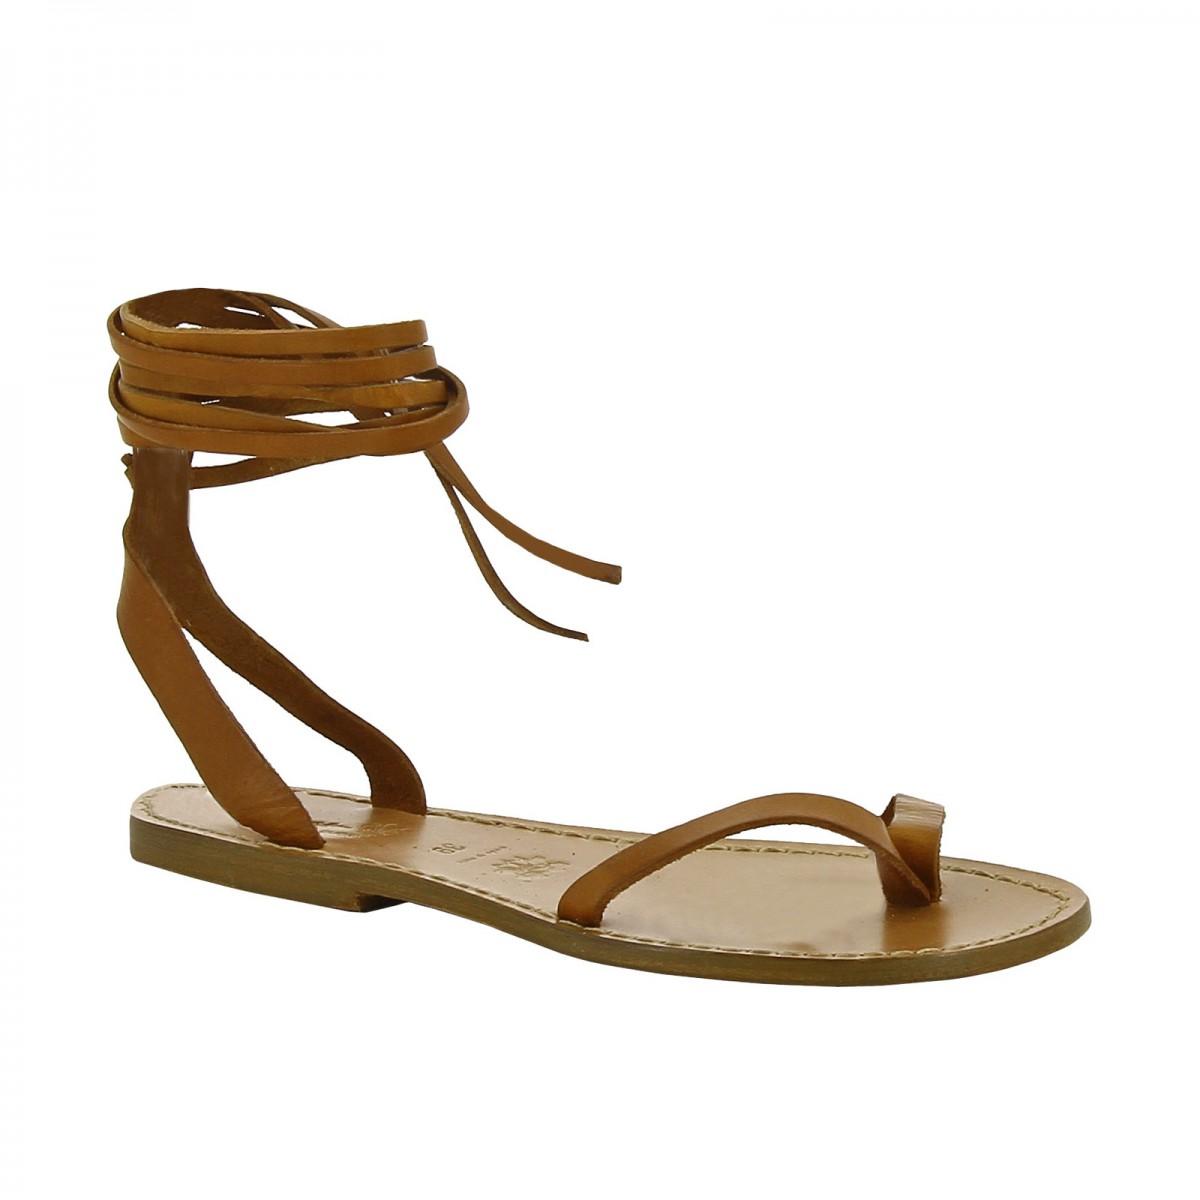 23e135d8638 Hecho a mano sandalias de tiras planas de cuero marrón. Loading zoom